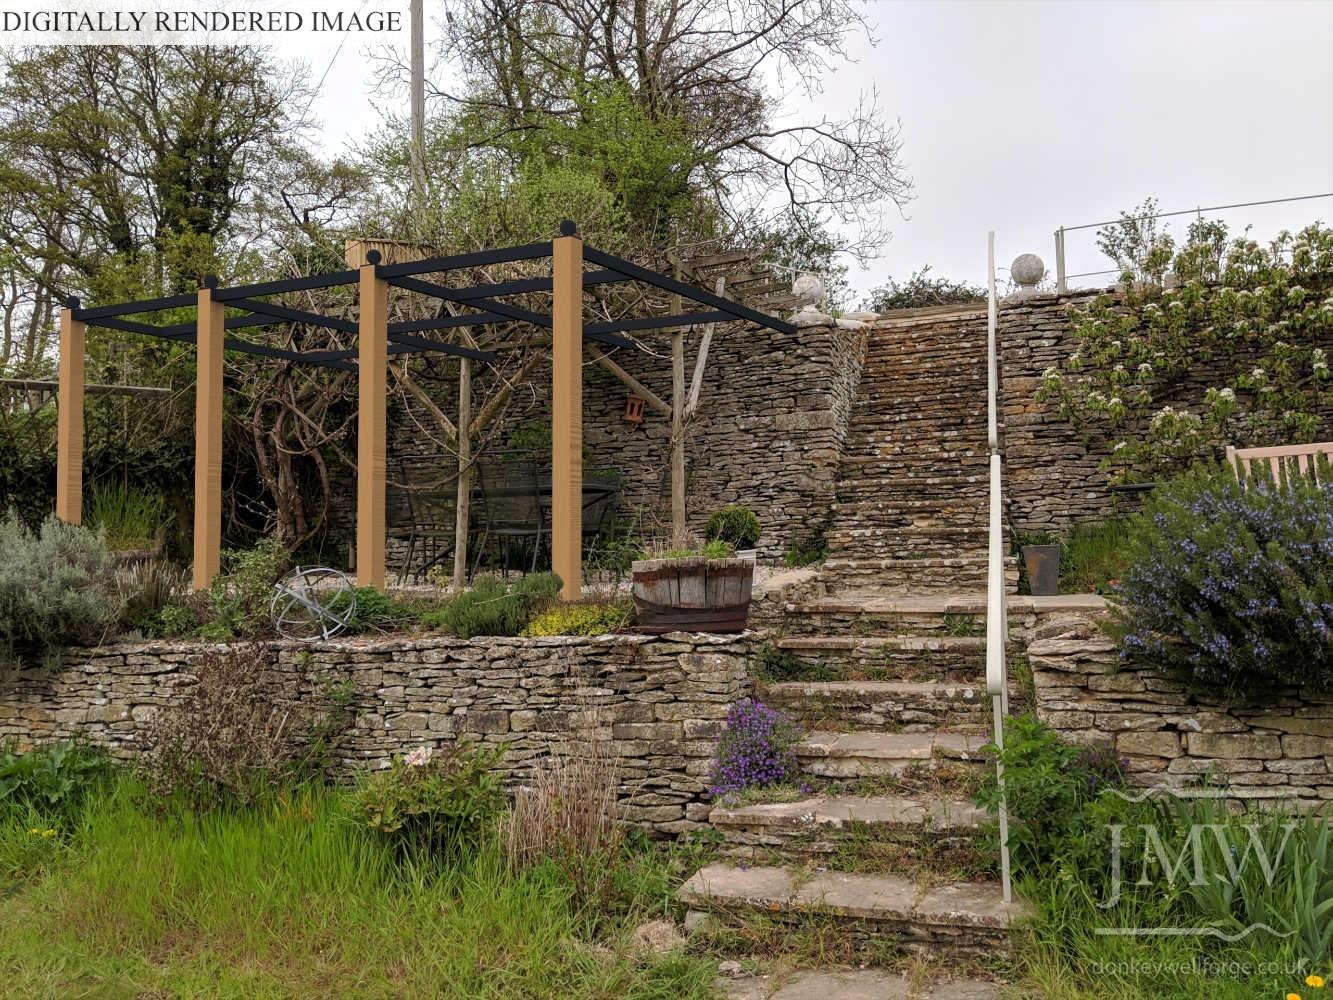 digitally-rendered-pergola-metalwork-garden